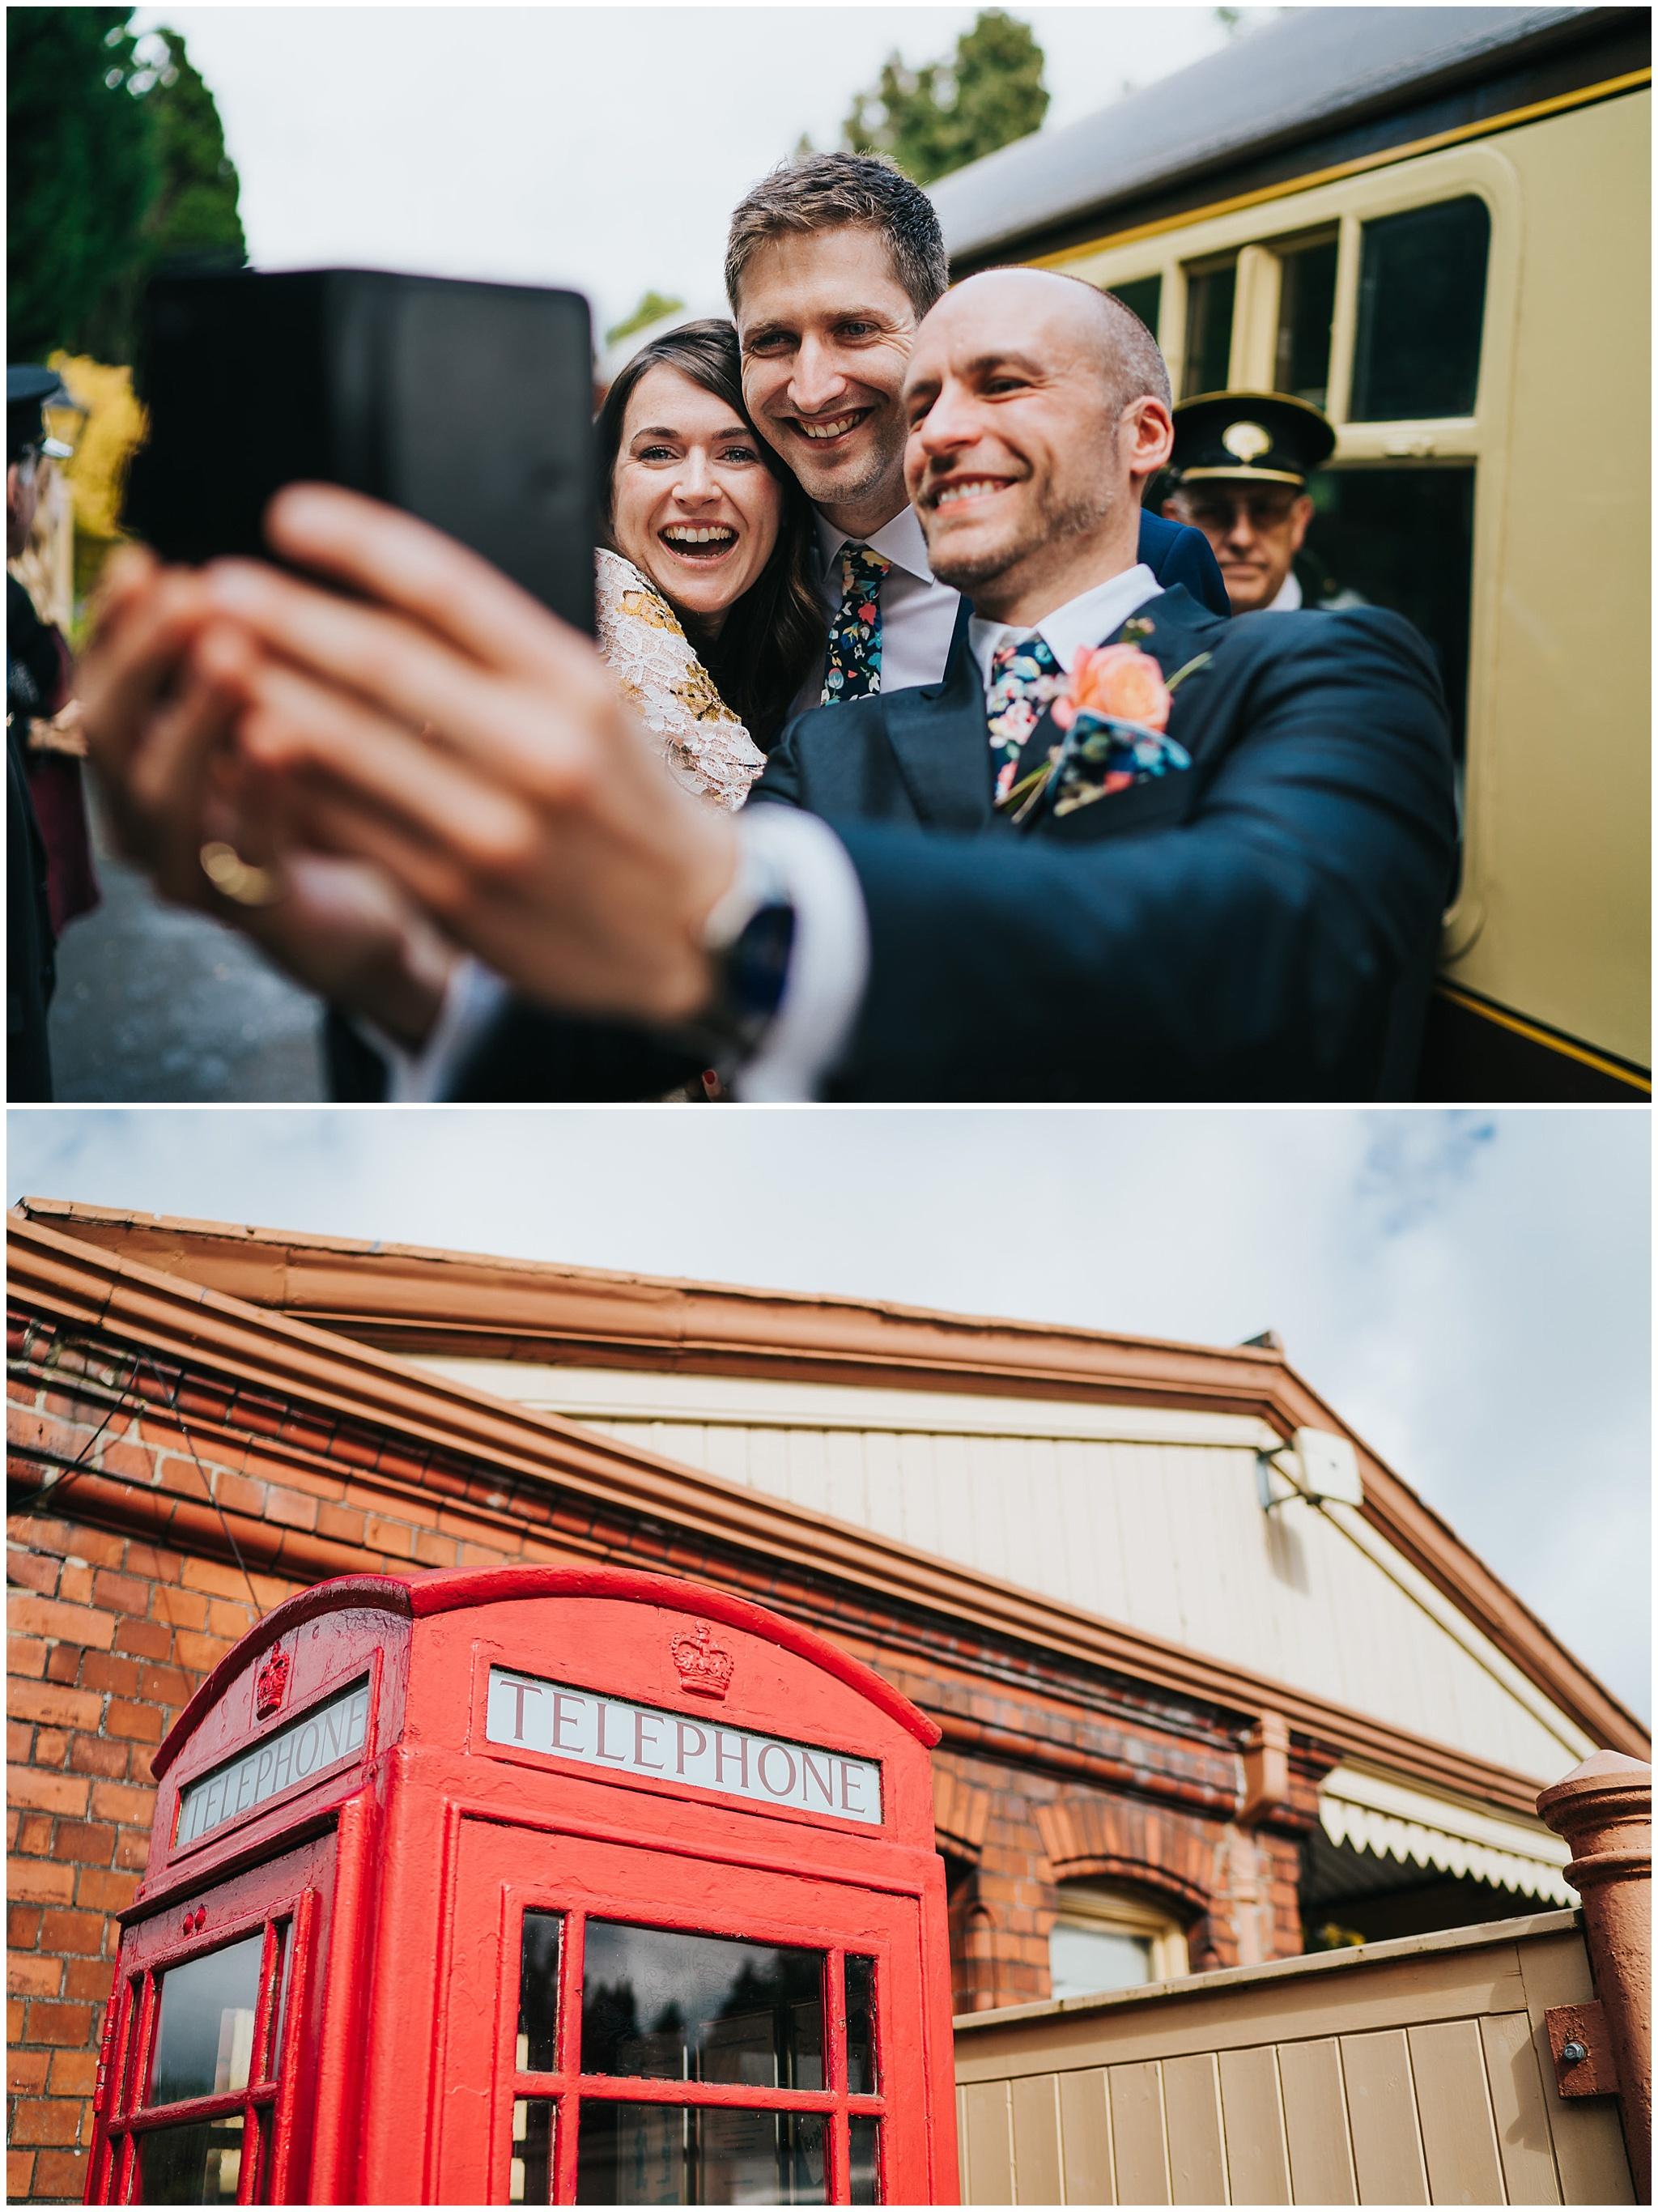 Stanway House Gloucester wedding photography056